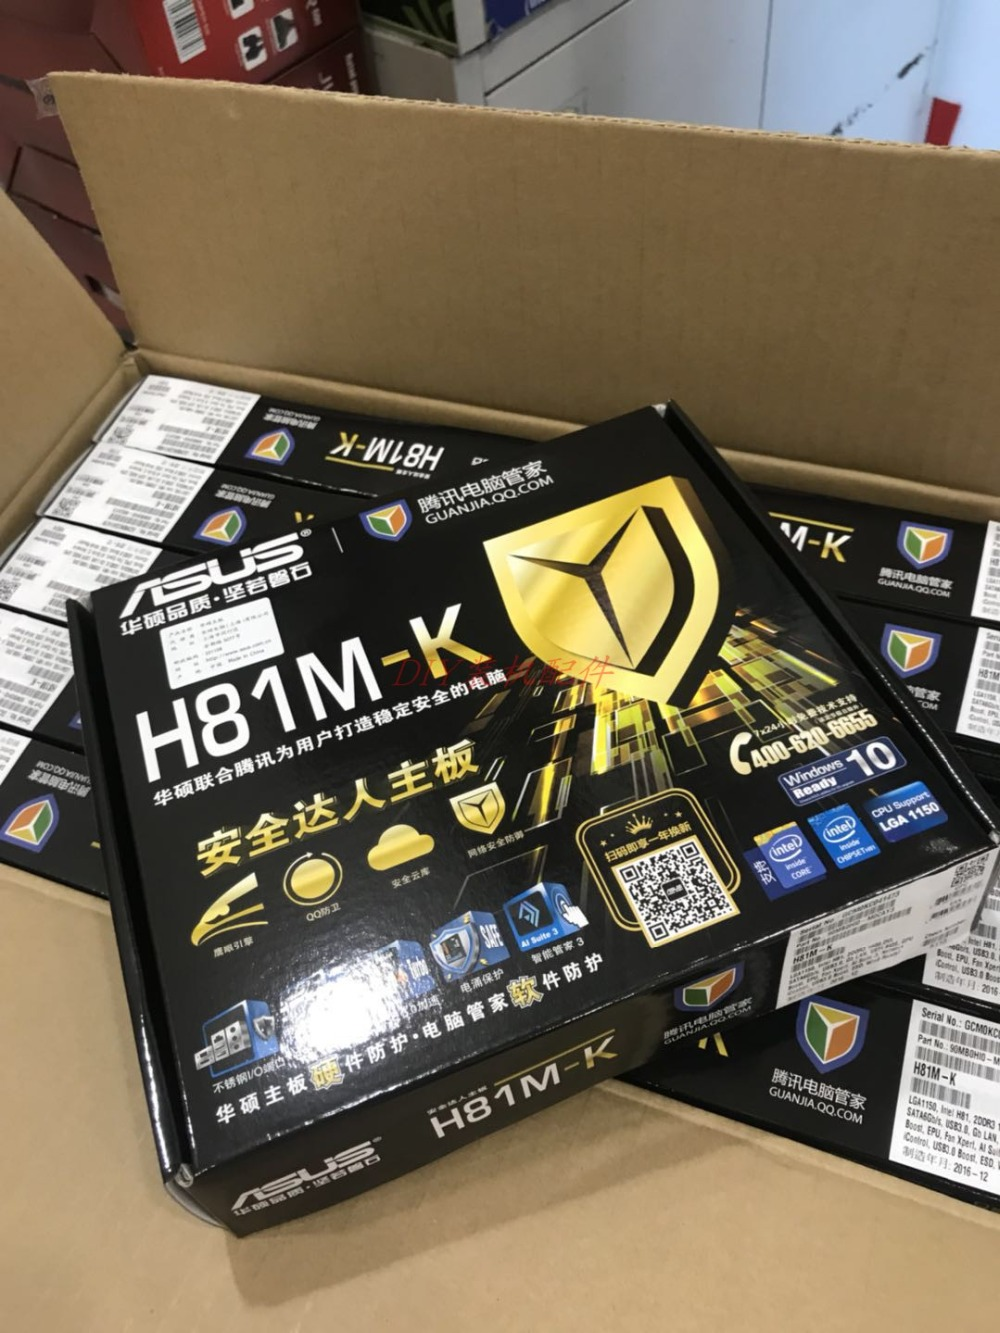 New Asus H81M-K Desktop Motherboard H81 Socket LGA 1150 I3 I5 I7 DDR3 16G Micro-ATX Original Mainboard Hot Sale